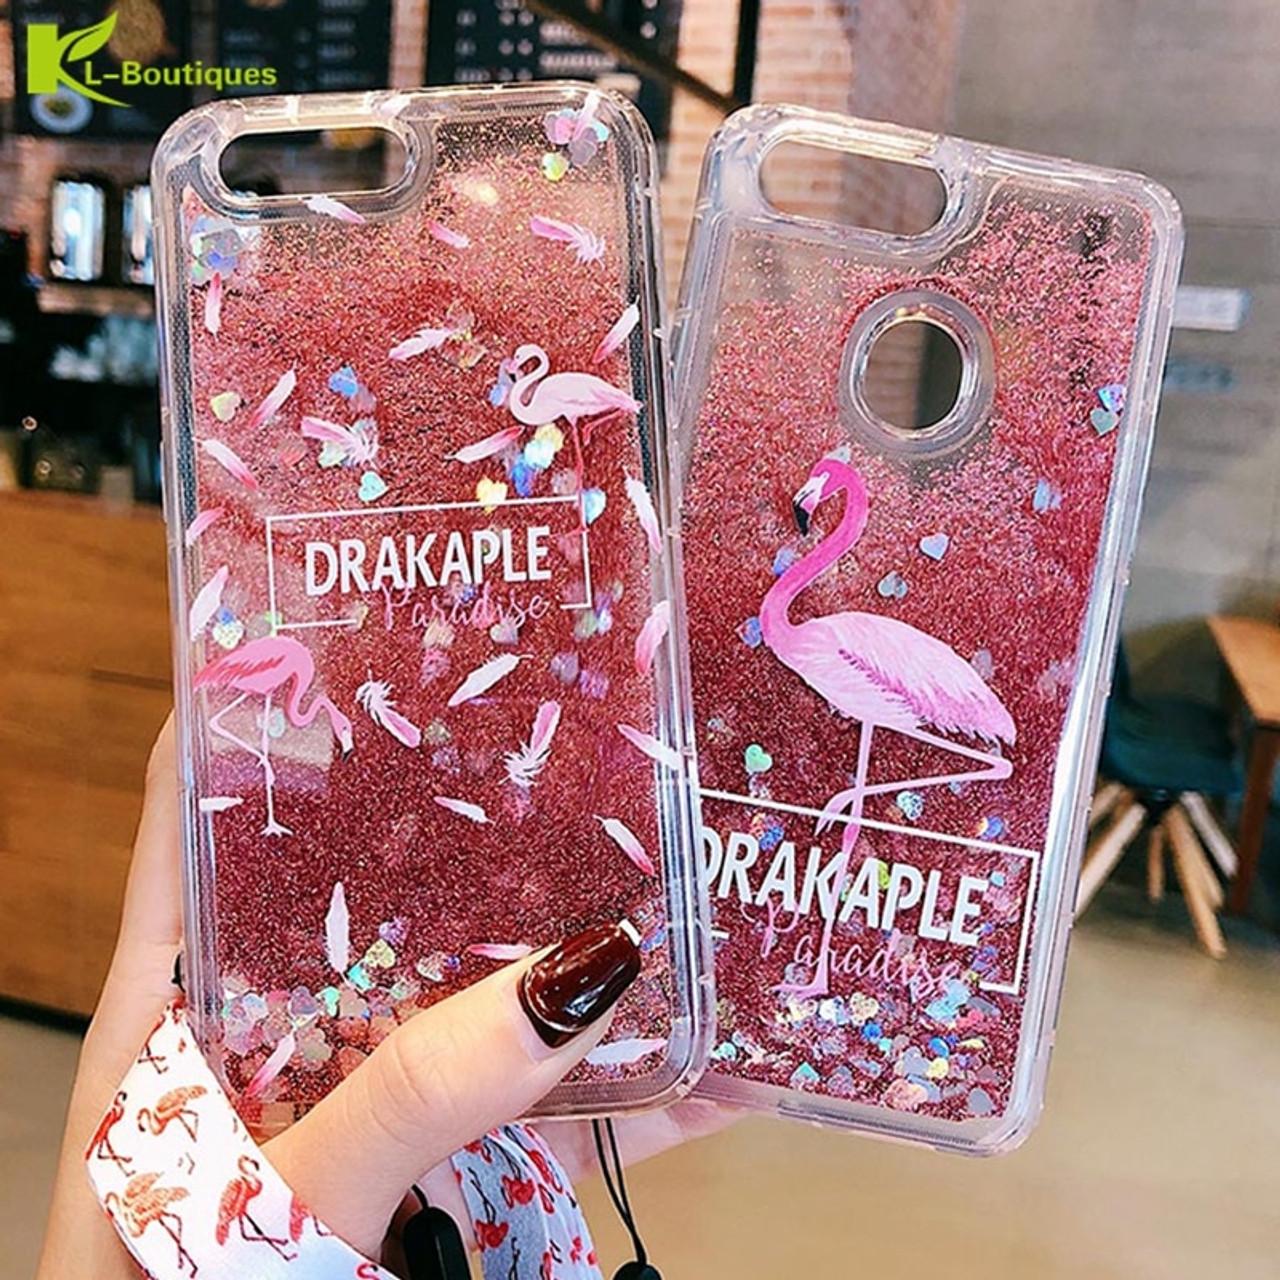 finest selection 1489b d33ba Coque sFor Huawei Honor 9 Lite Glitter Liquid Quicksand Flamingo Phone Case  on for Fundas Huawei Honor 9 Lite Case Cover Pouzdro